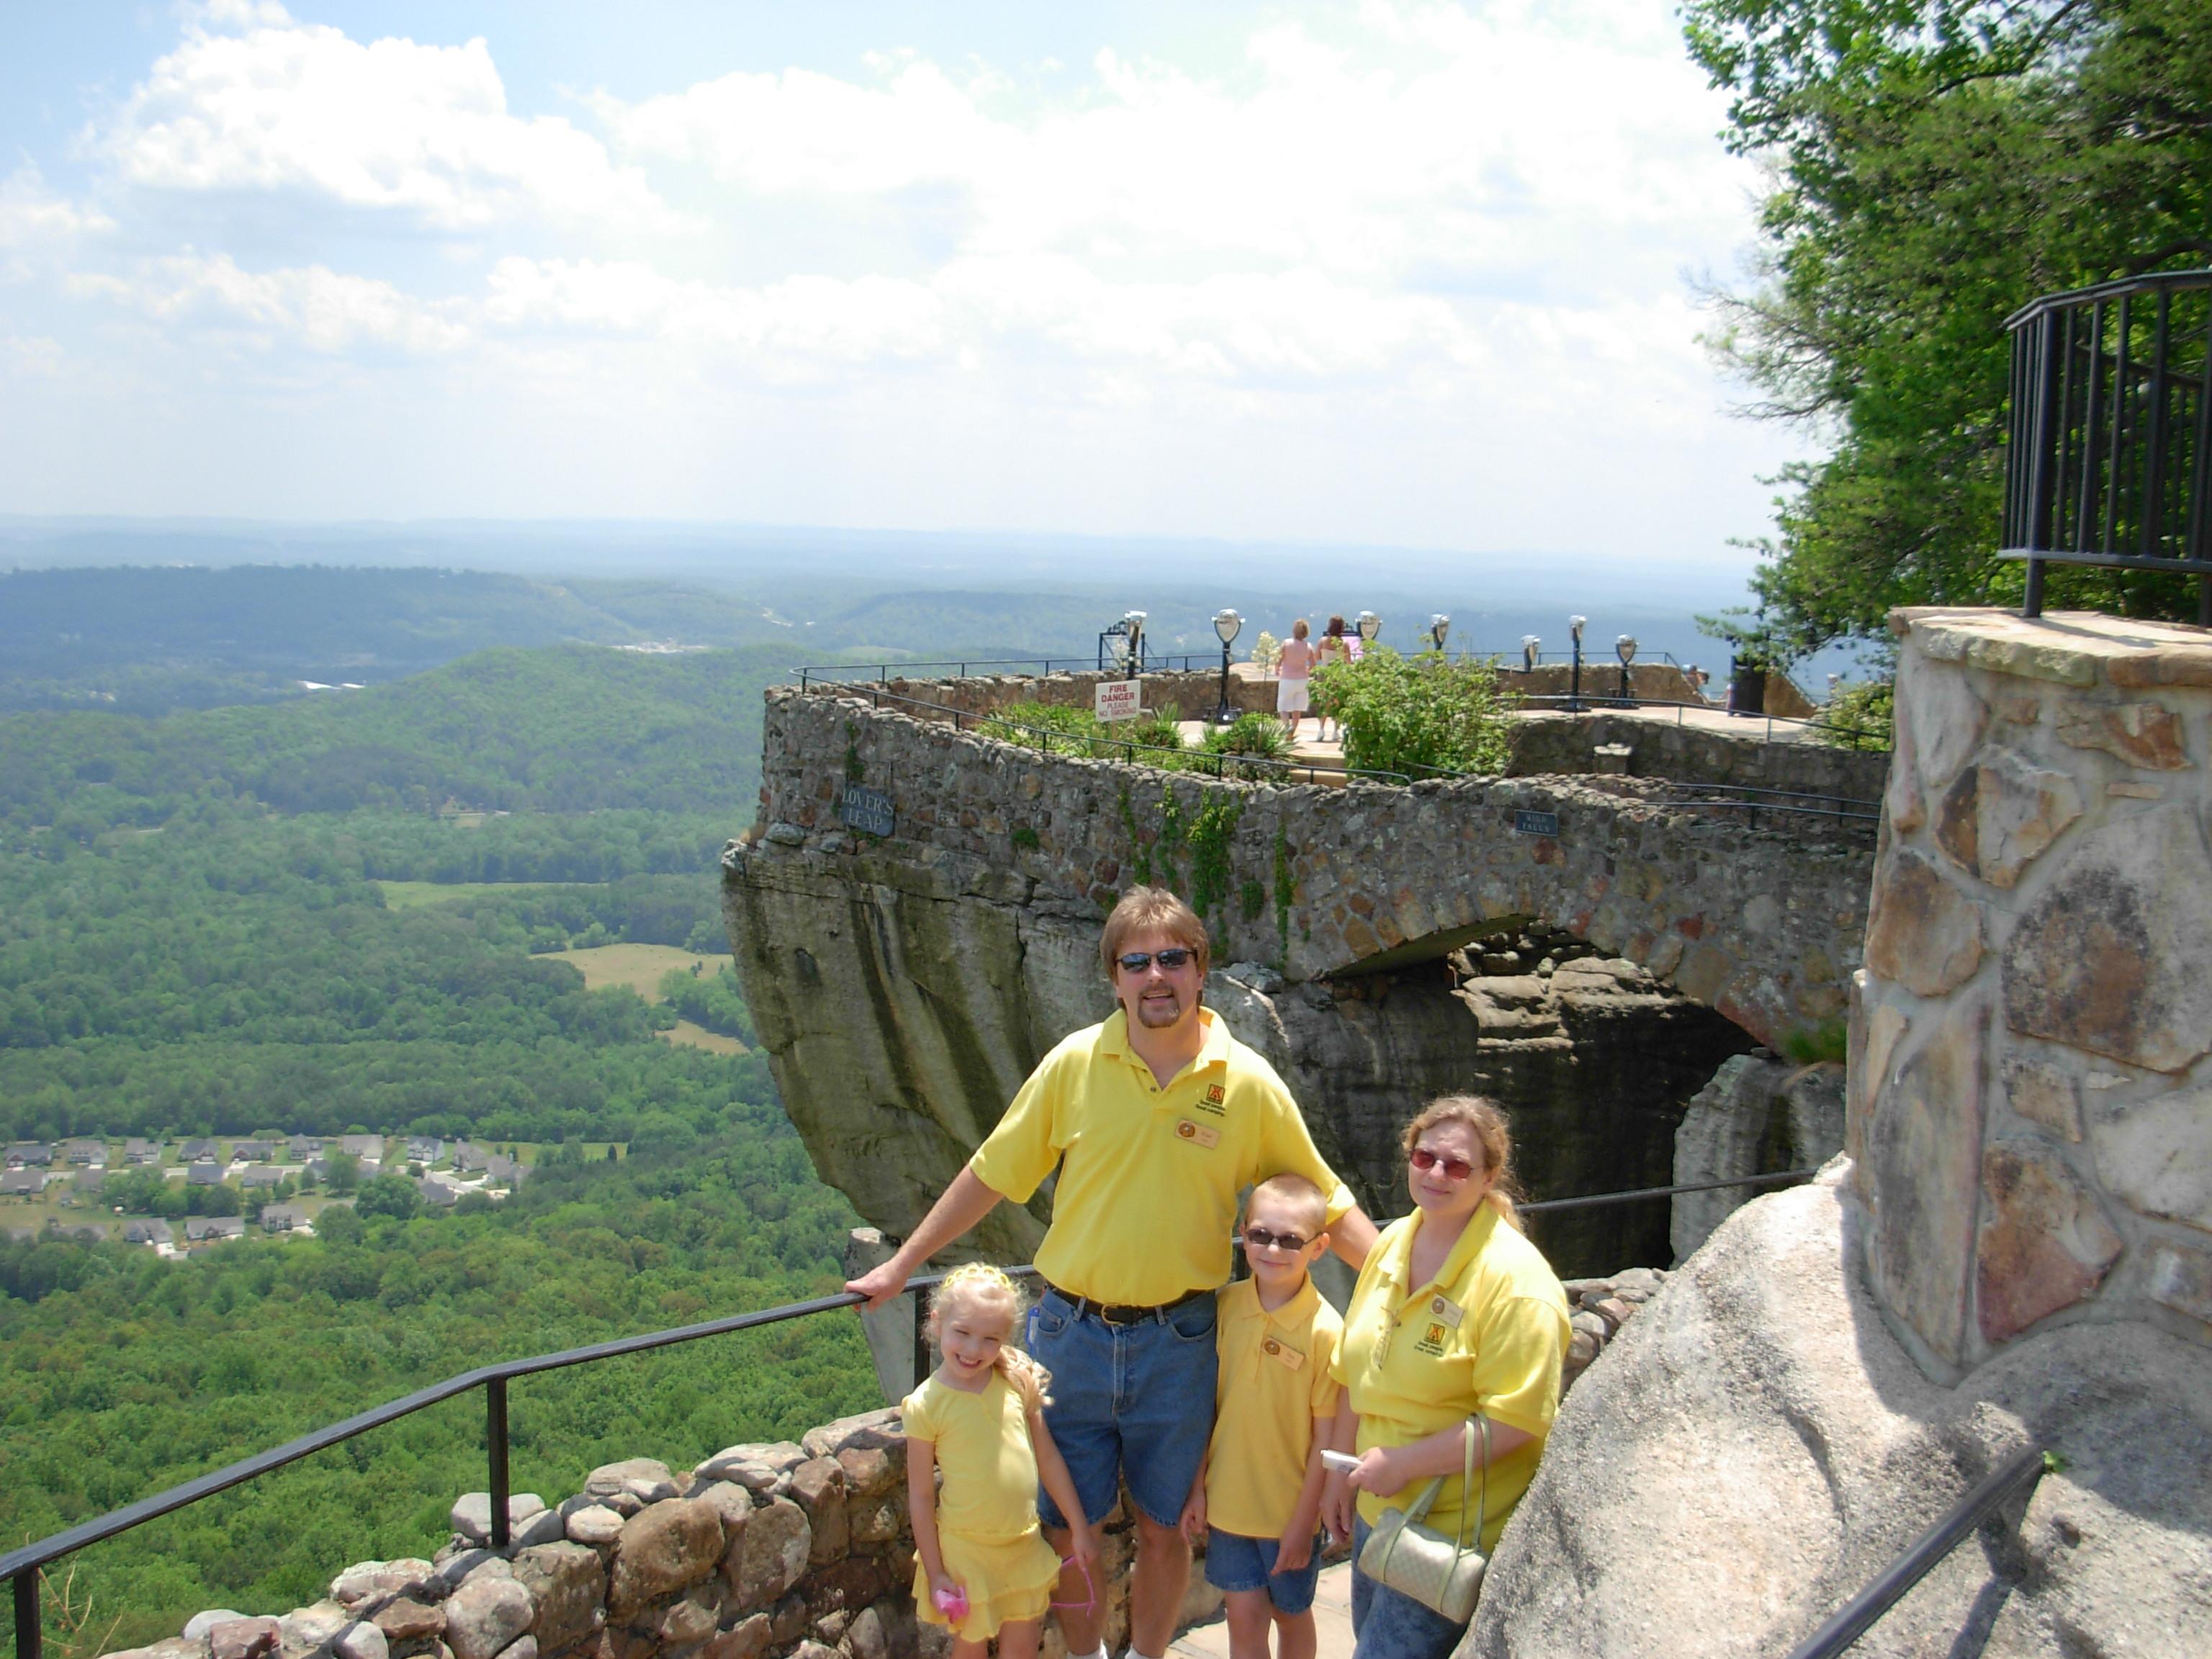 Lookout Mountain / Chattanooga West KOA Holiday